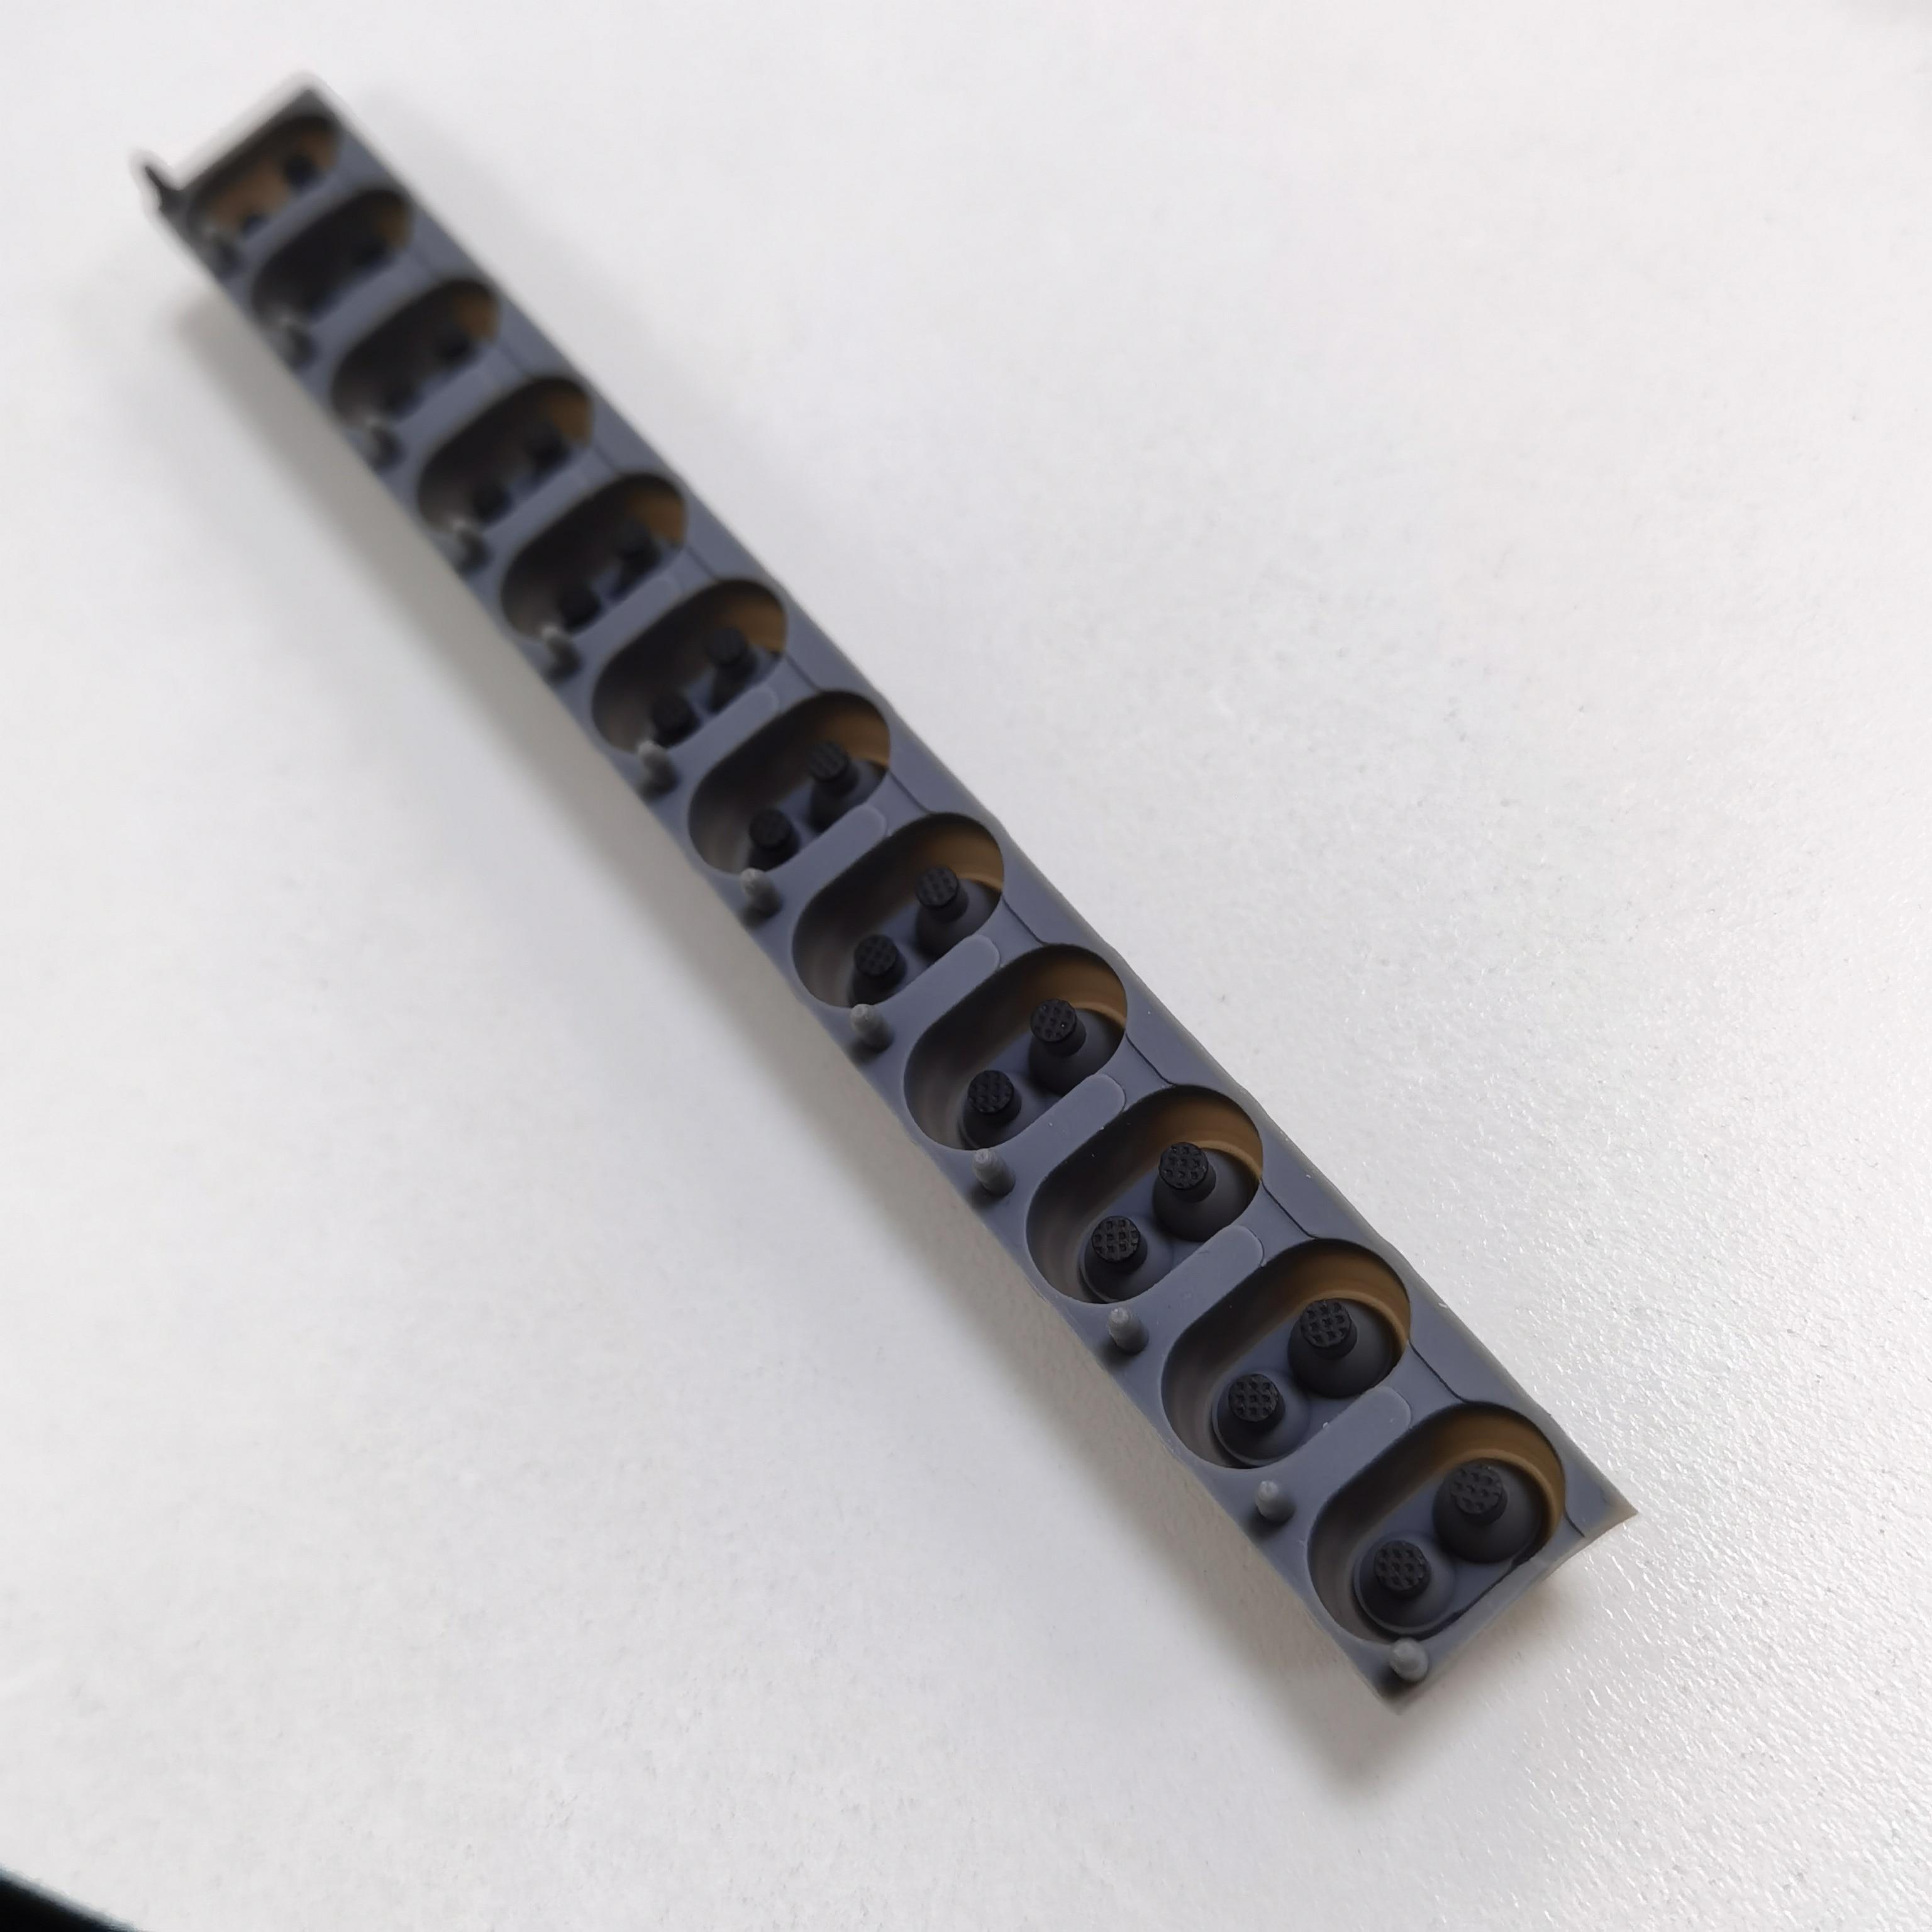 D-pad para Yamaha Botão da Almofada do Contato Psr-s550 para Borracha Condutora Substituir Psr-e413. Psr-s500